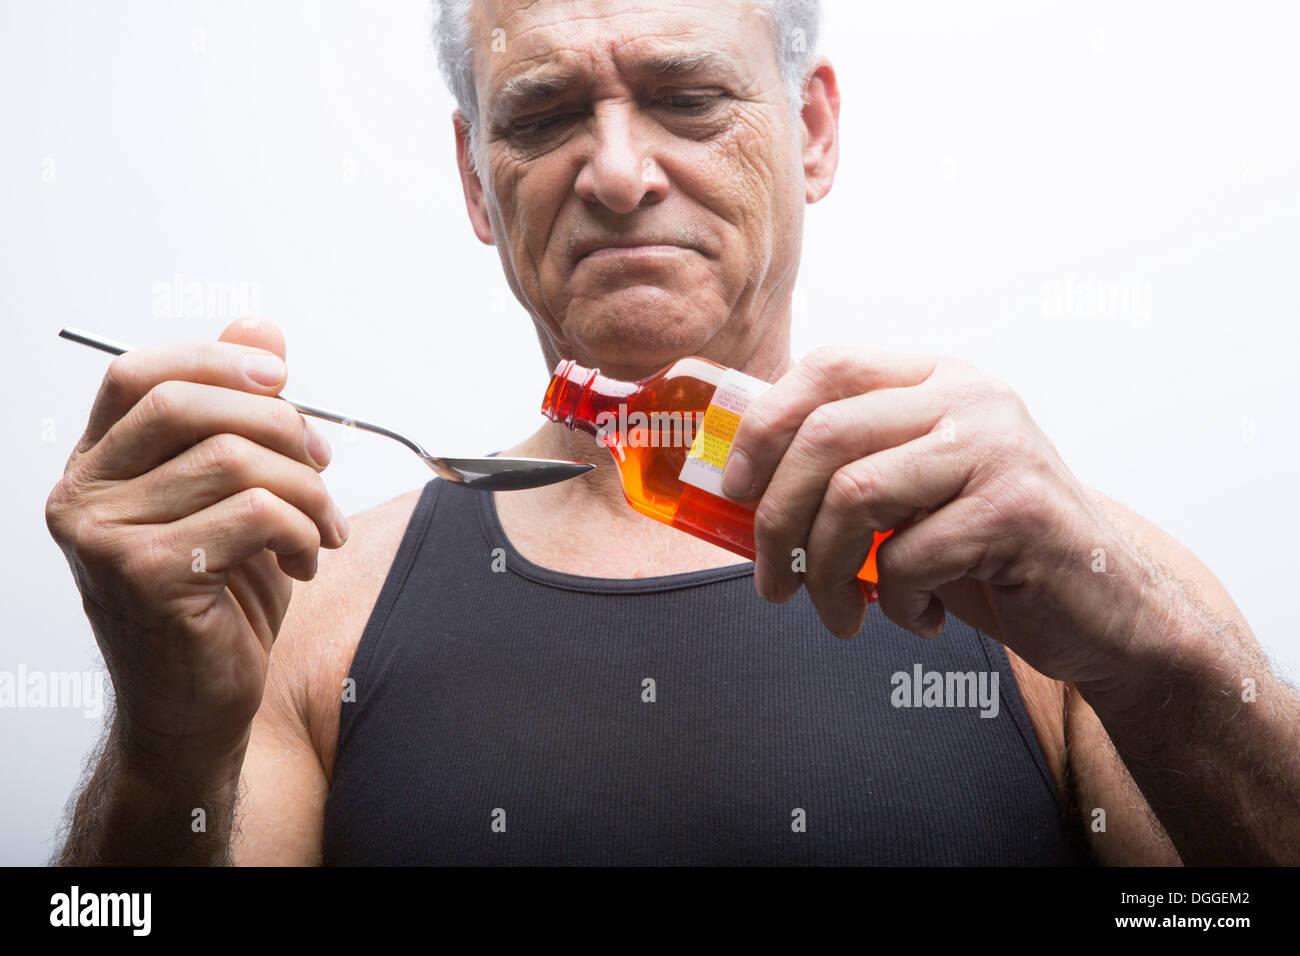 Senior man pouring medicine from bottle - Stock Image